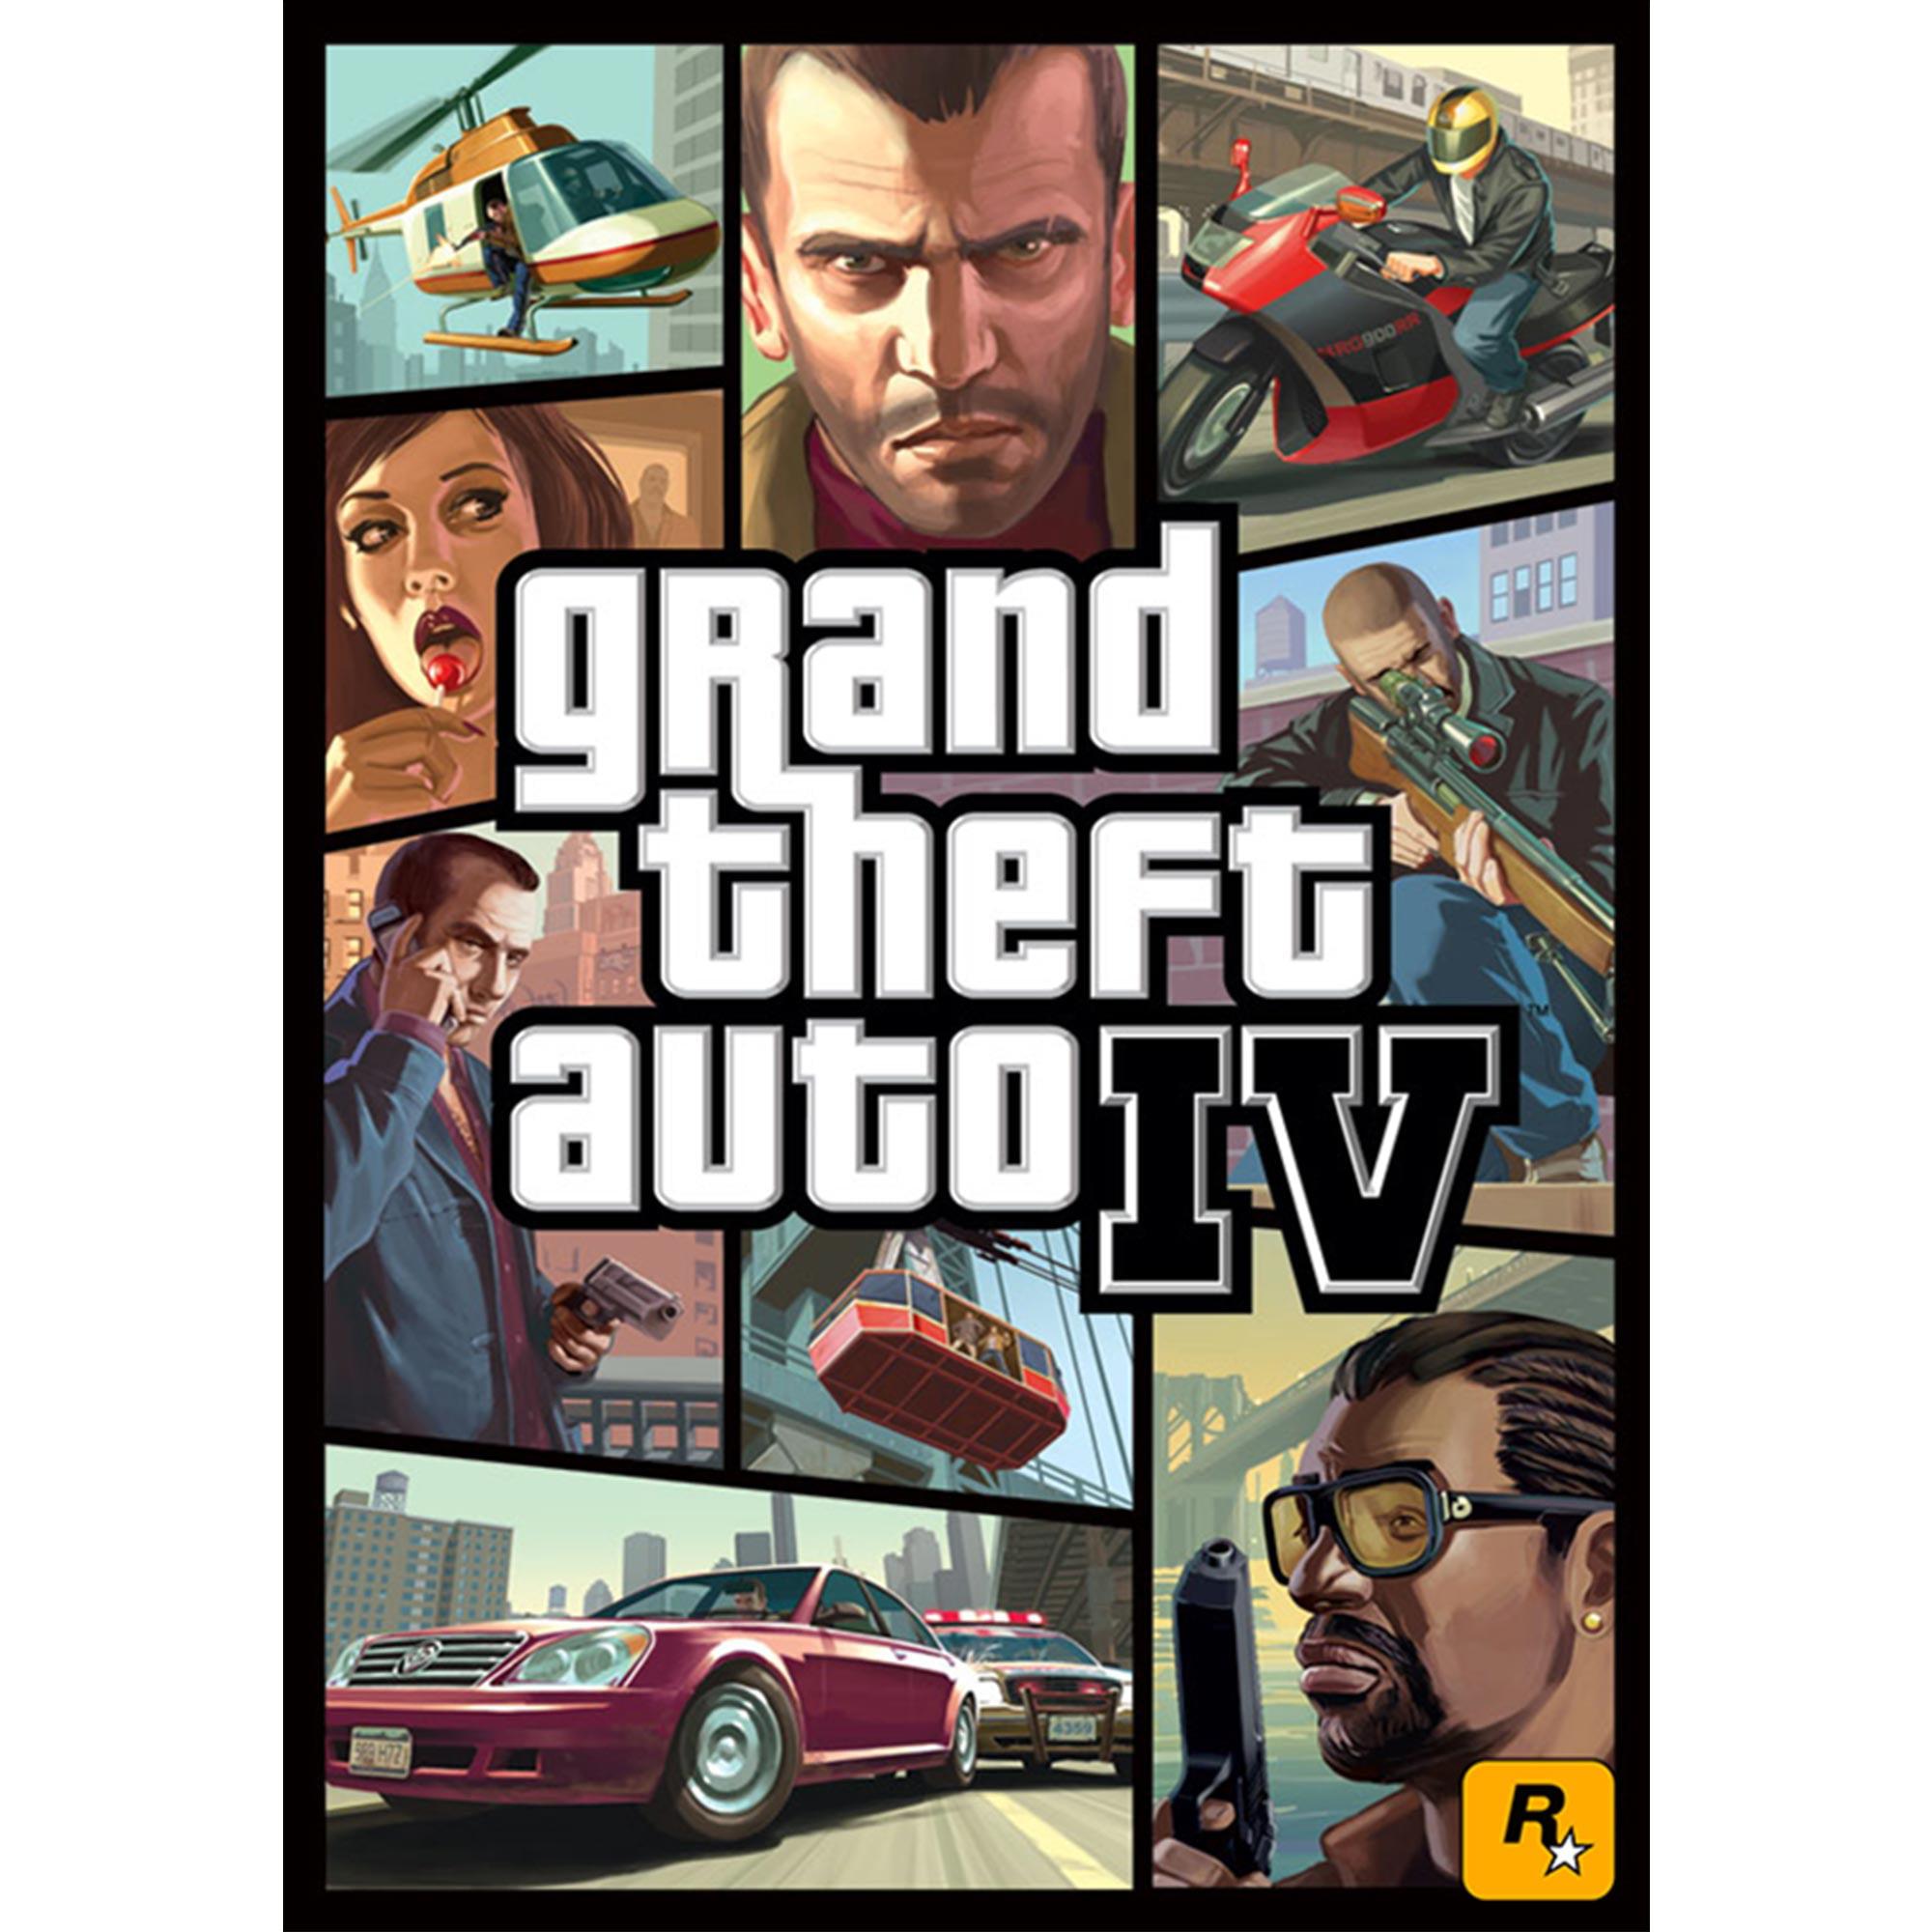 Grand theft auto v rockstar games grand theft auto: vice city.